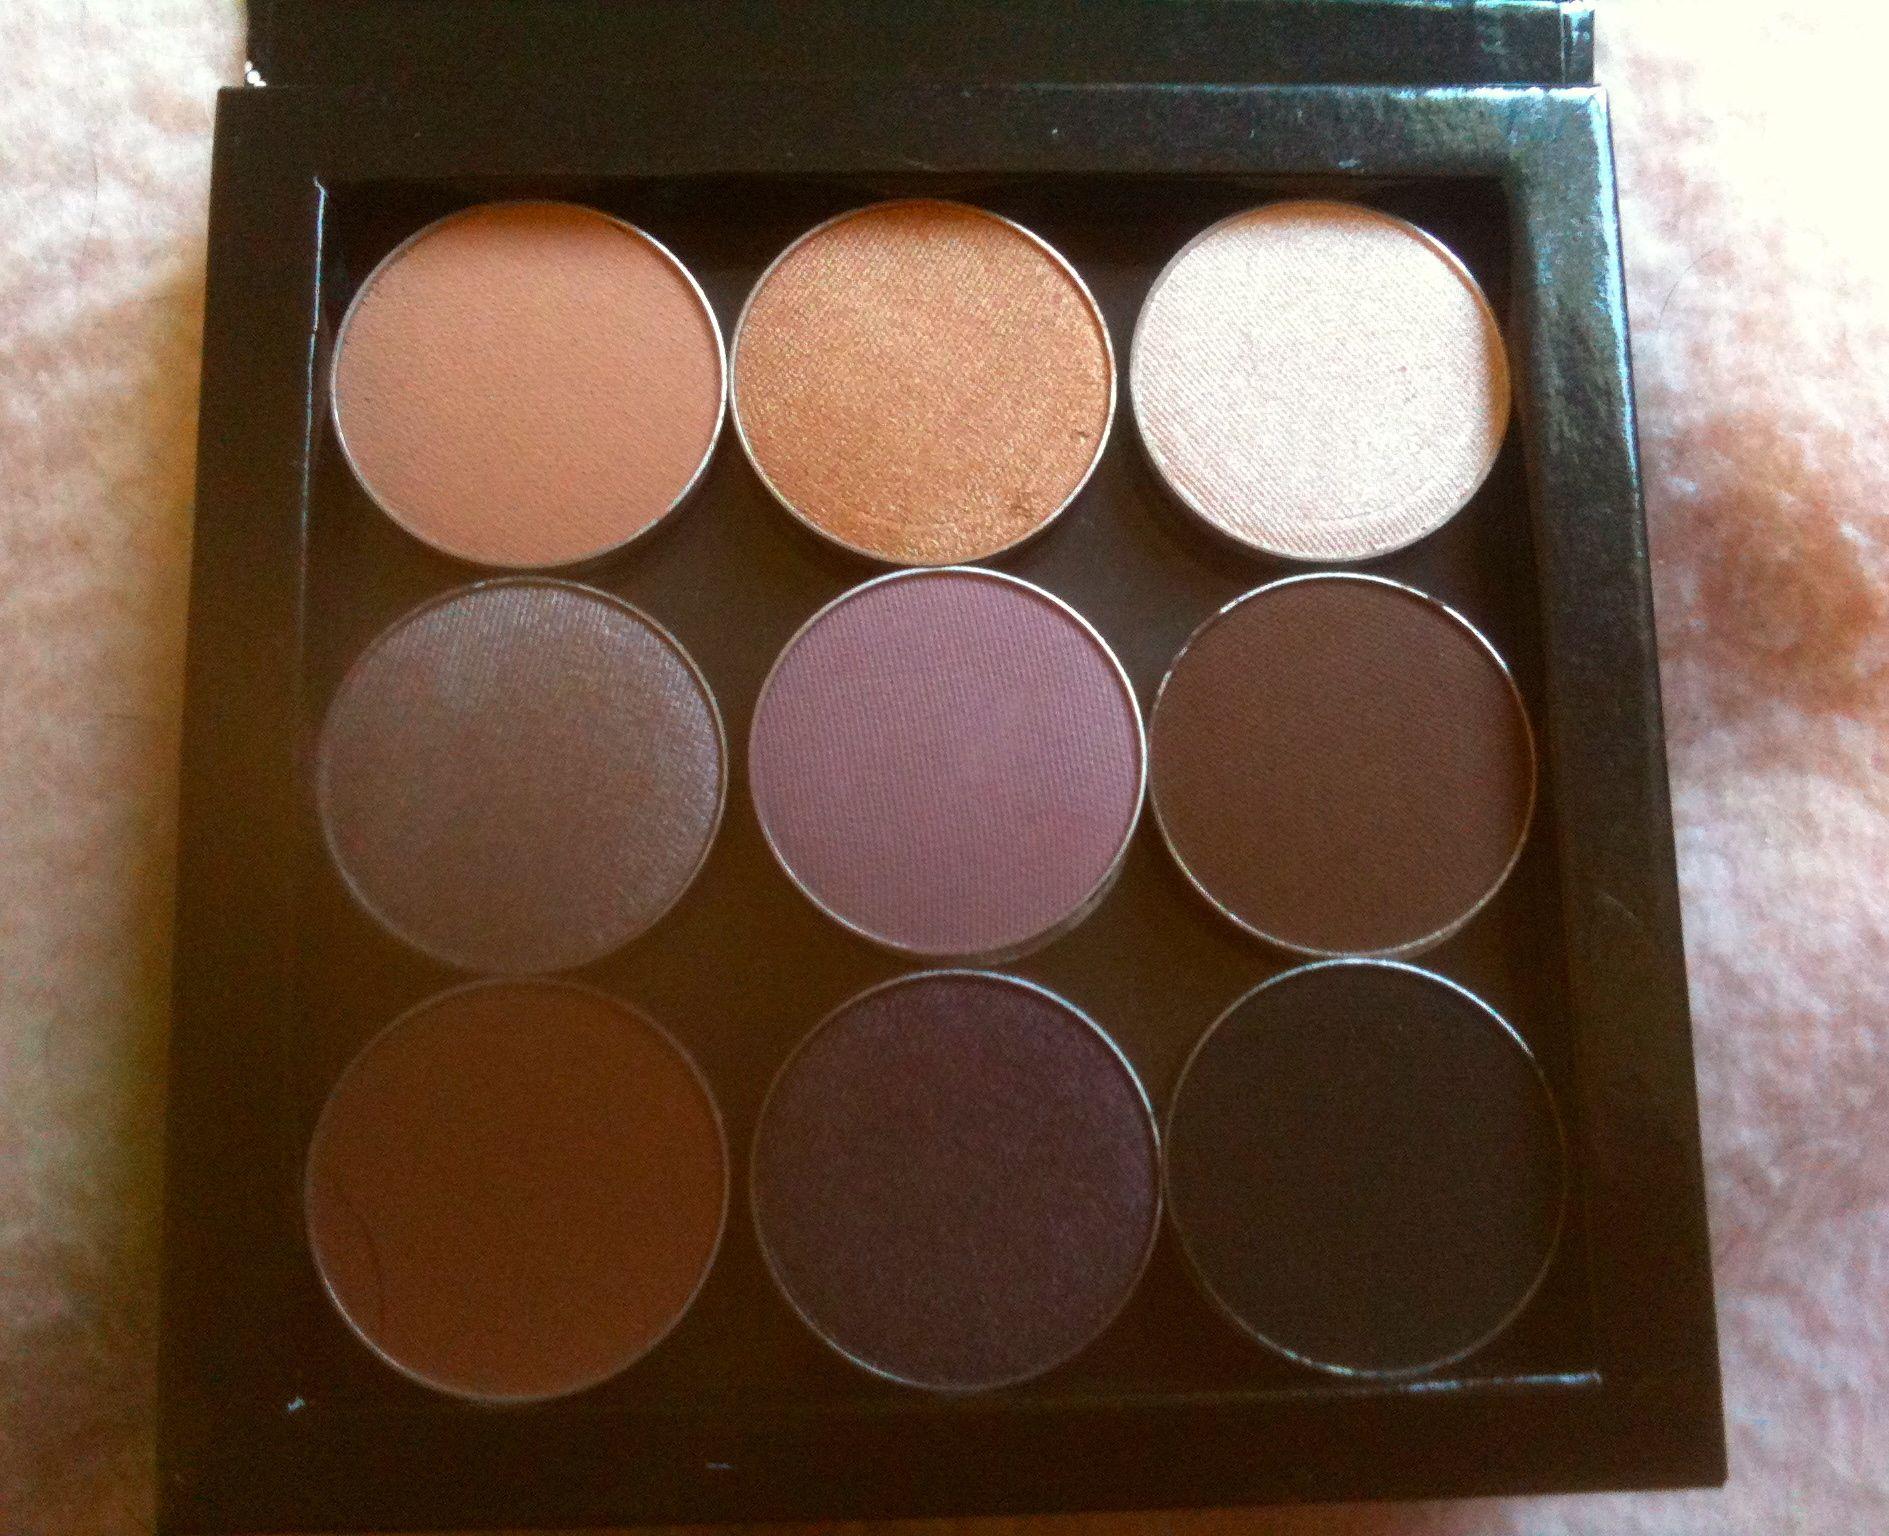 Maquillaje Geek 9-Eyeshadow Starter Kit - Sombras de Ojos